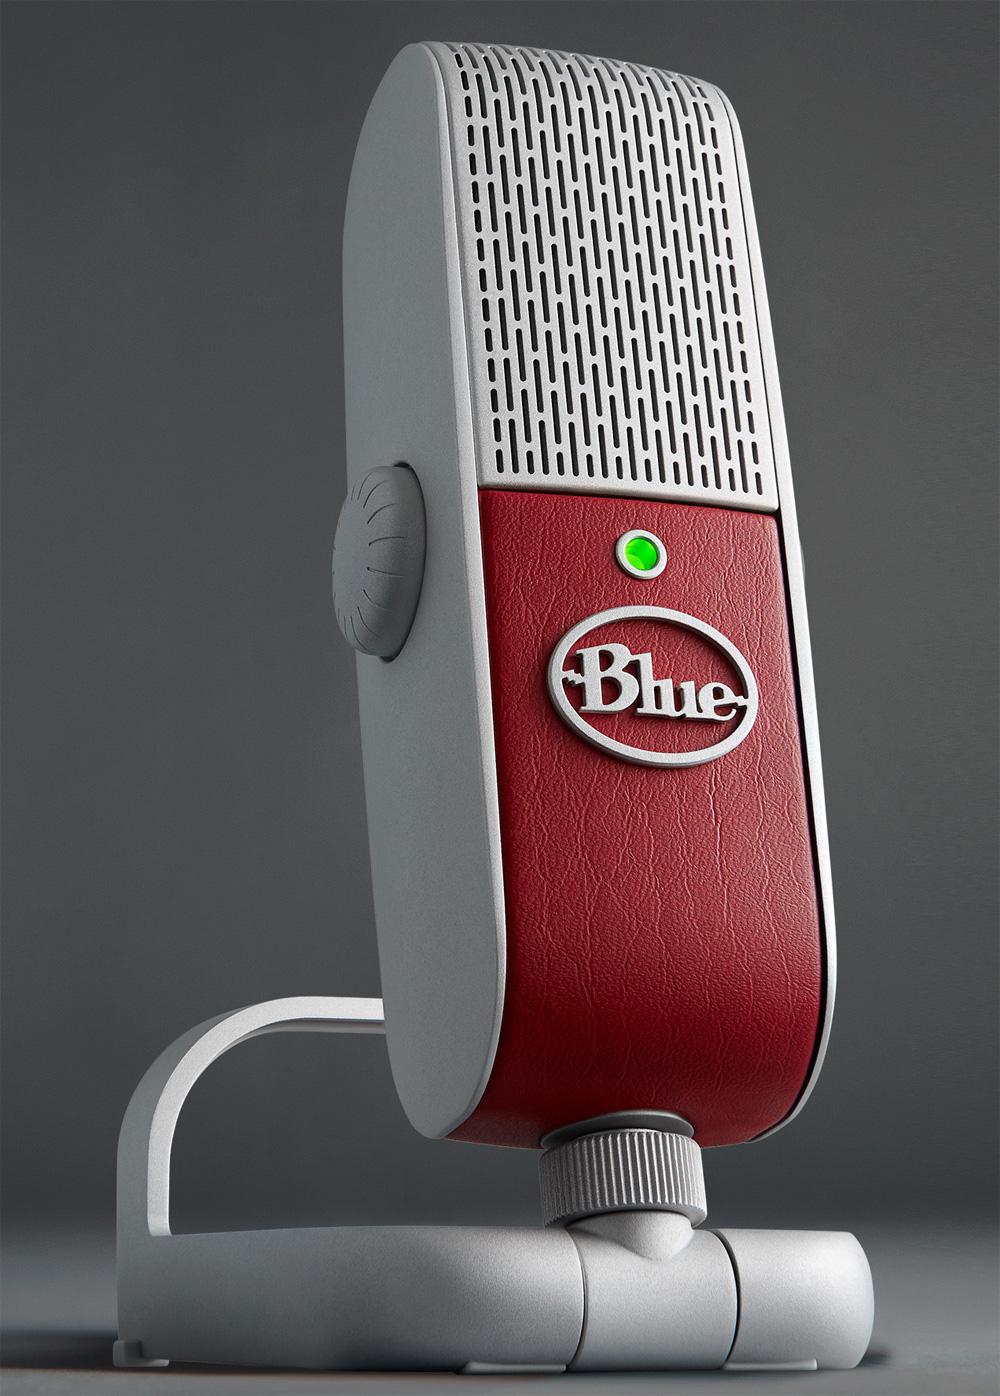 Blue Microphones Raspberry : microphone usb et lightning condensateur large diaphragme blue microphones raspberry ~ Vivirlamusica.com Haus und Dekorationen